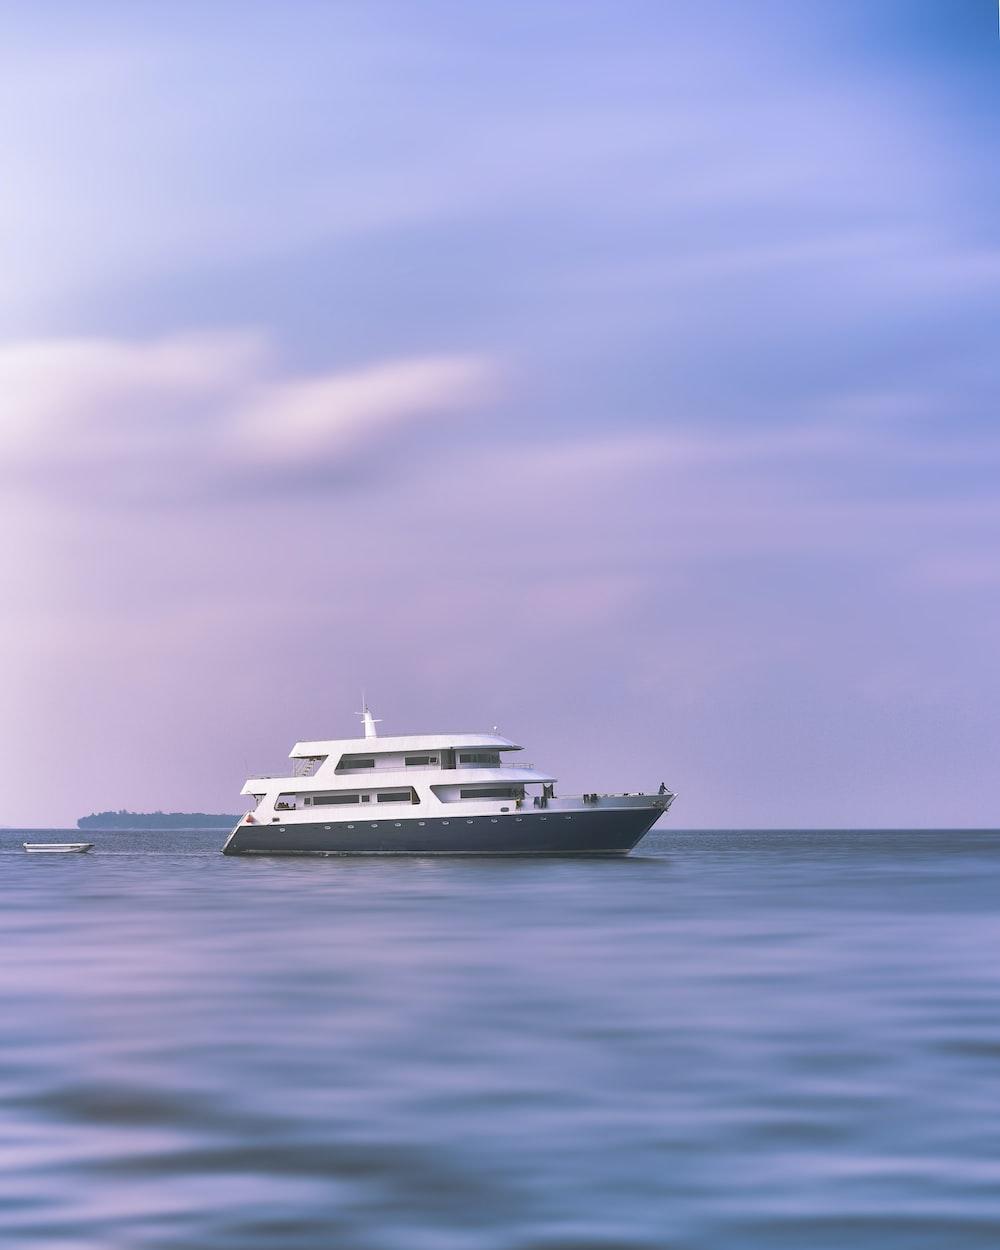 white and gray yacht